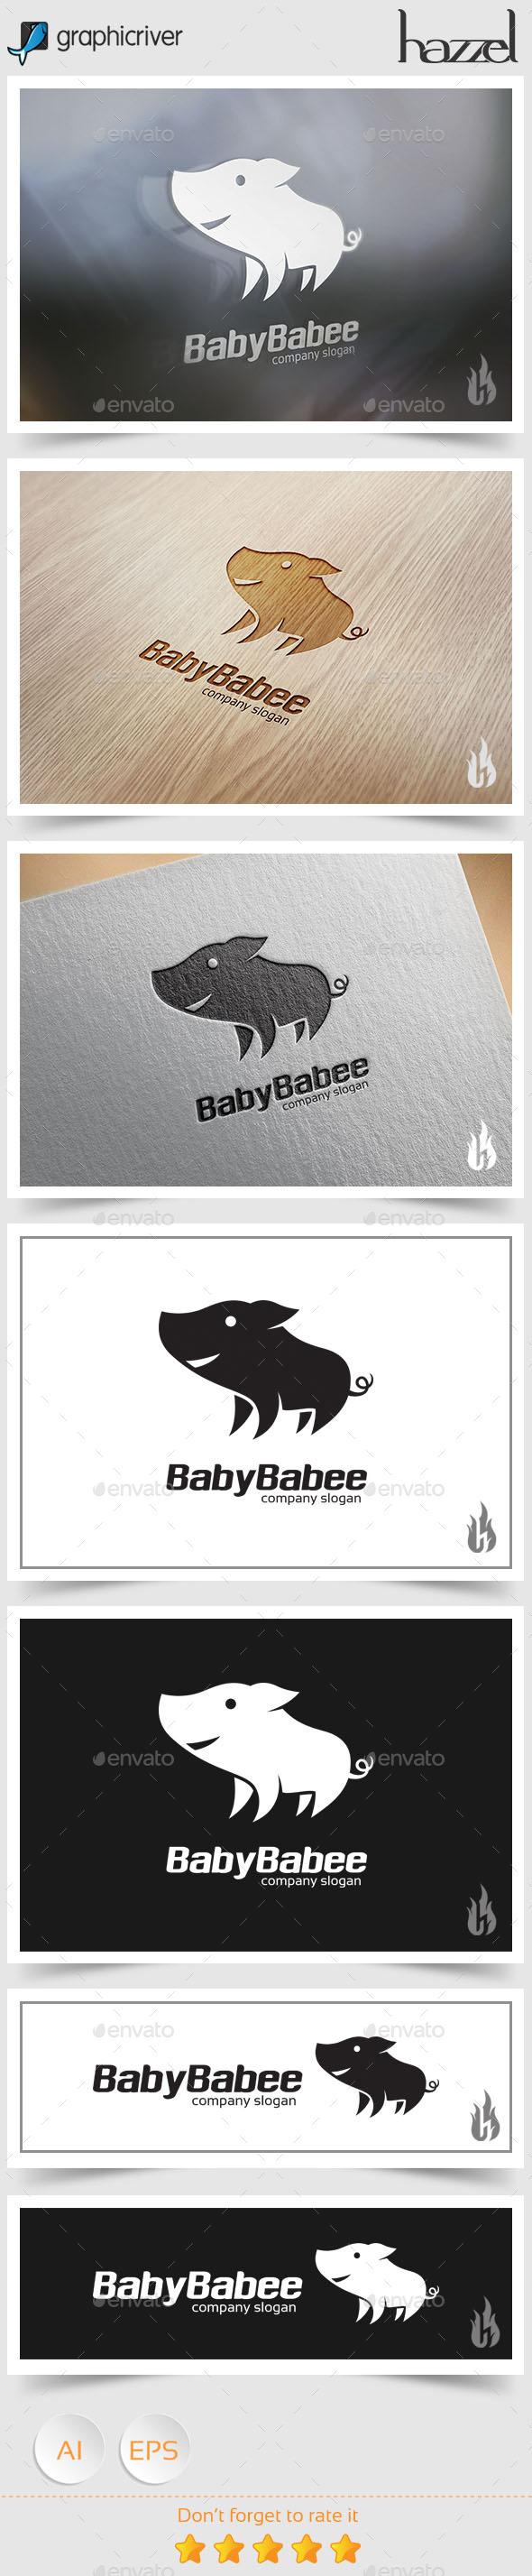 GraphicRiver Baby Babee Logo 8916598